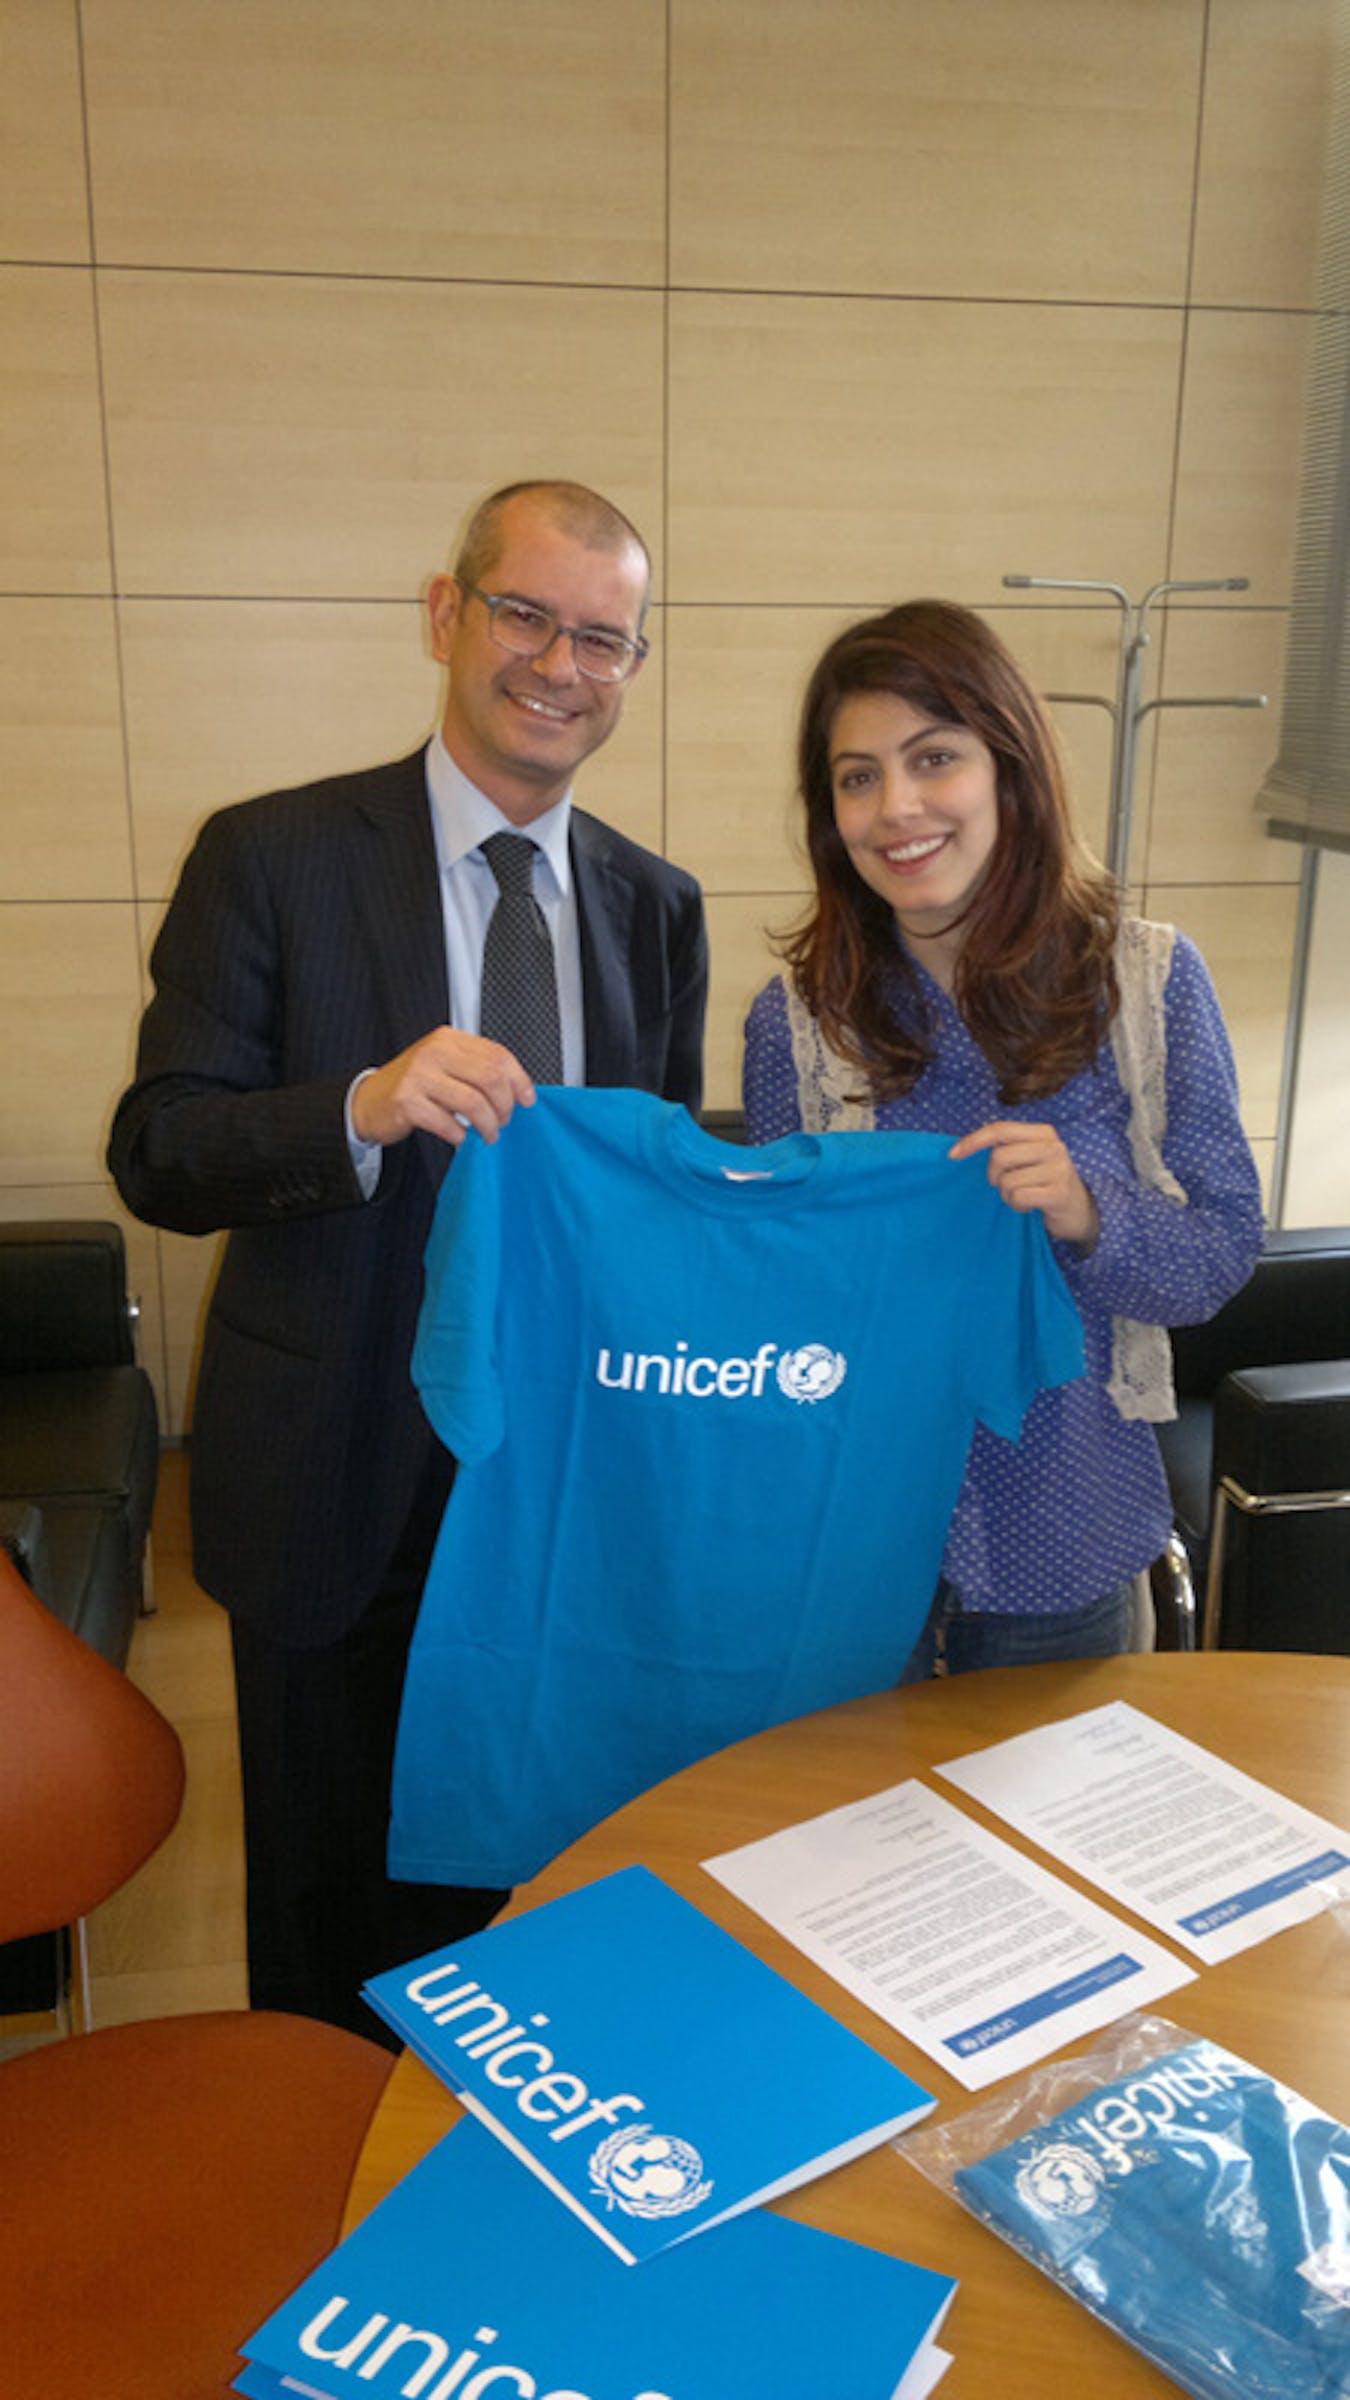 Alessandra Mastronardi insieme al Direttore generale dell'UNICEF Italia, Davide Usai - ©UNICEF Italia/2012/Loukarellis